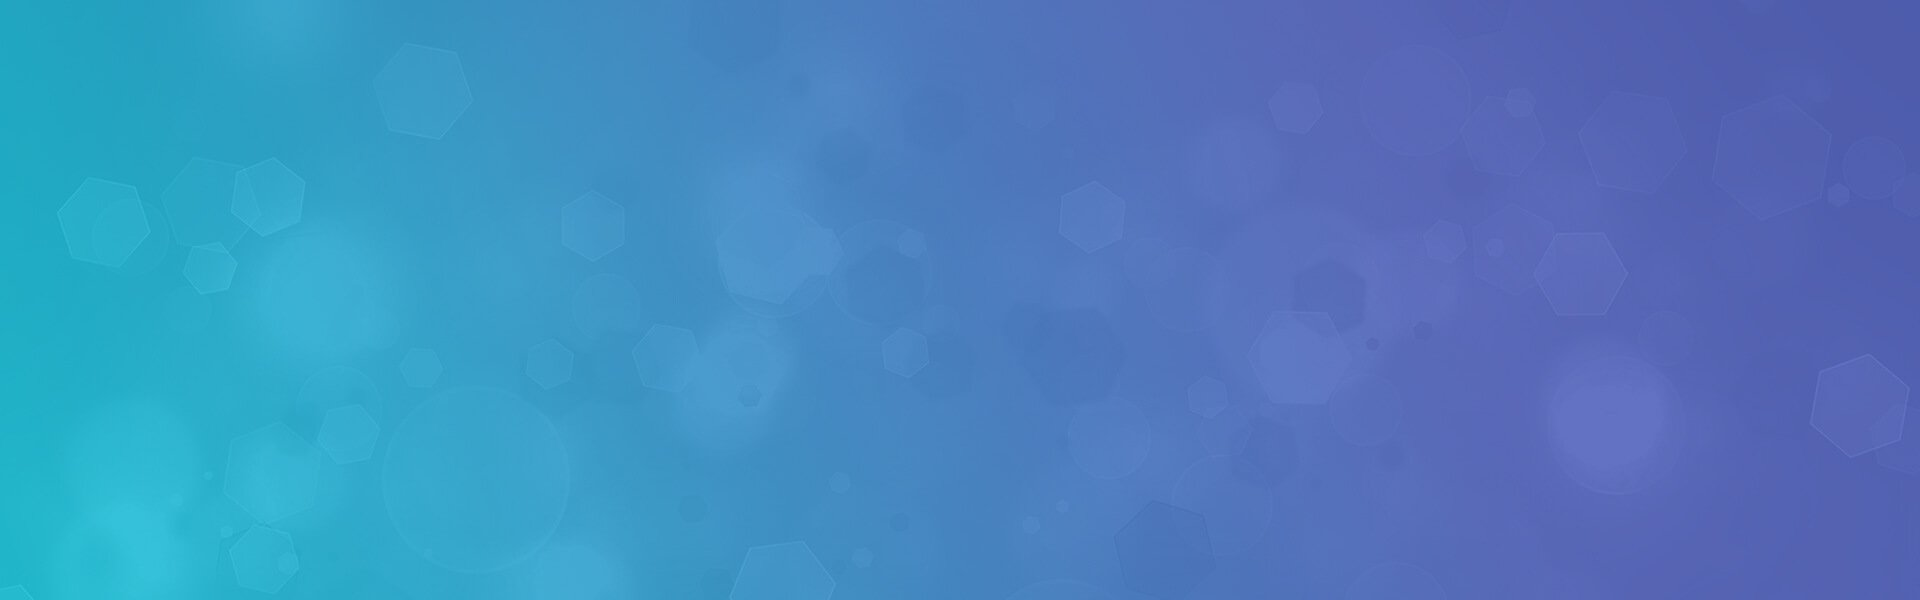 blue background slider